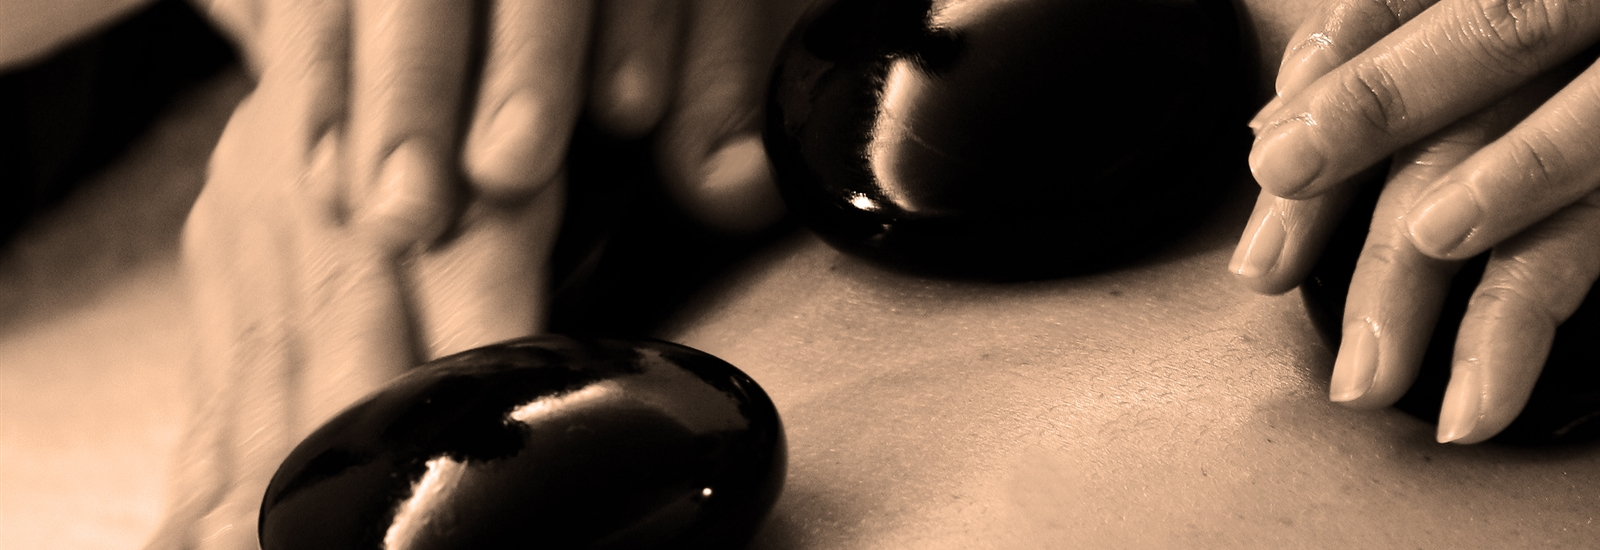 Massaggi IMG 3480 copy 2